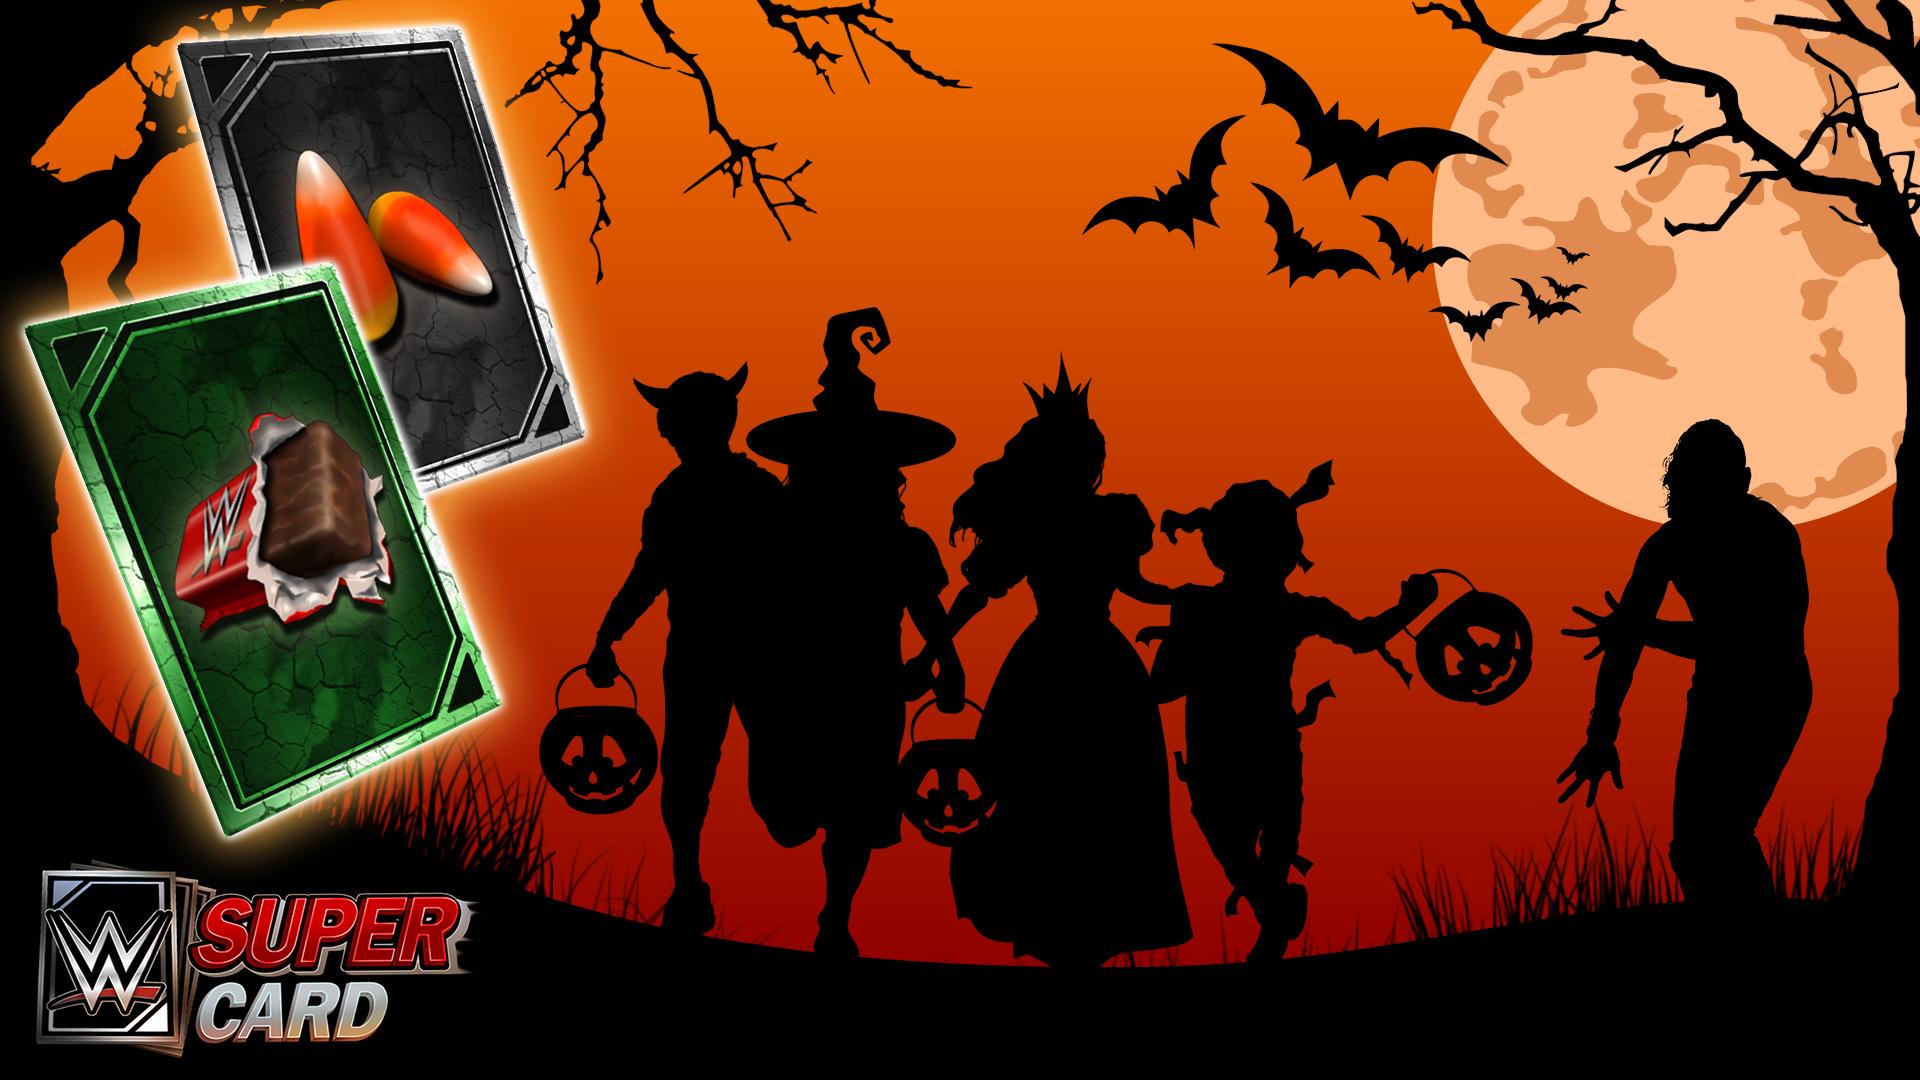 Wwe Supercard Du Contenu Exclusif Pour Halloween